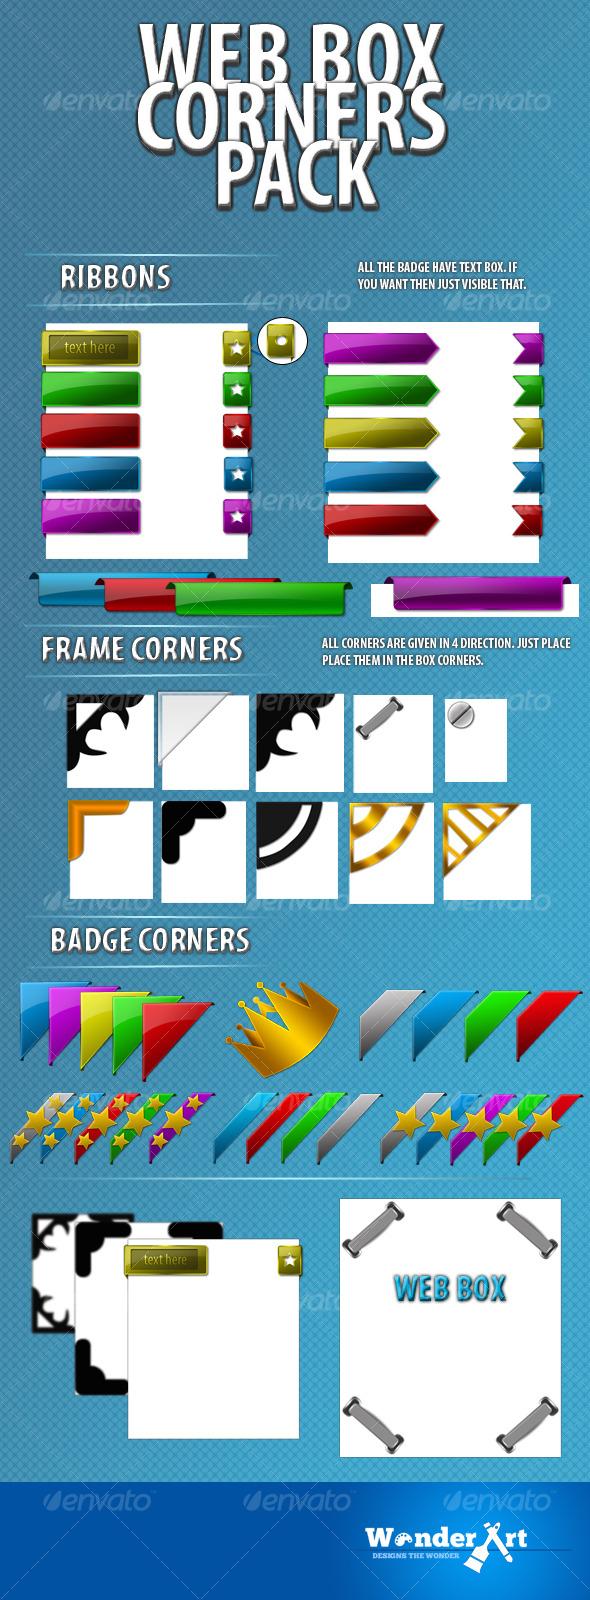 Web box corners pack